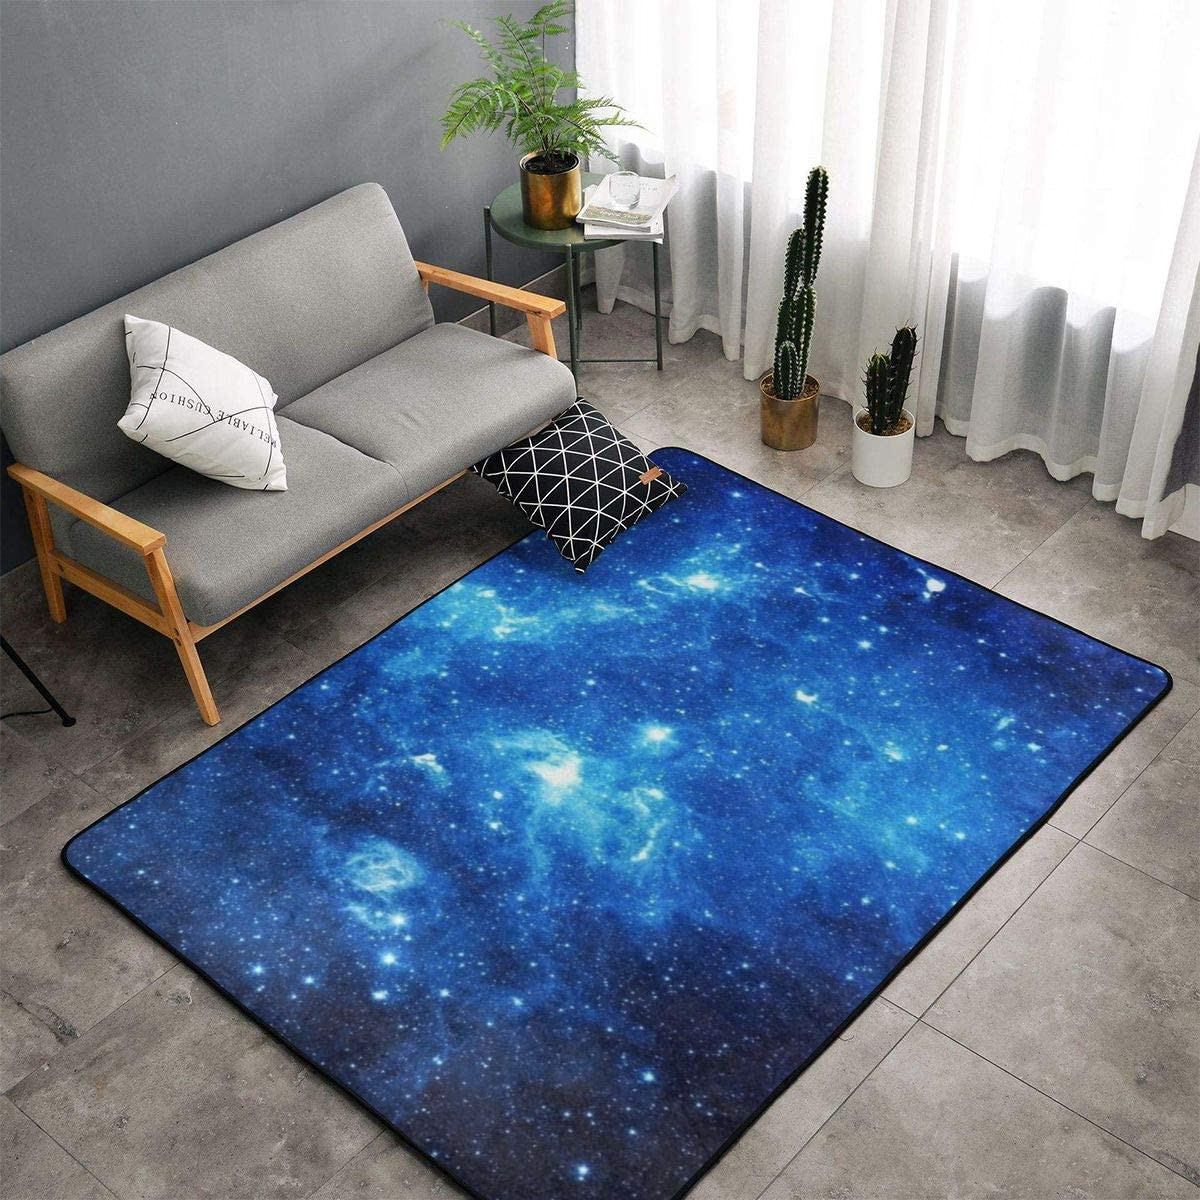 NiYoung Blue Galaxy Area Rug SALENEW very popular! D Popular standard Kitchen Bedroom Room Living